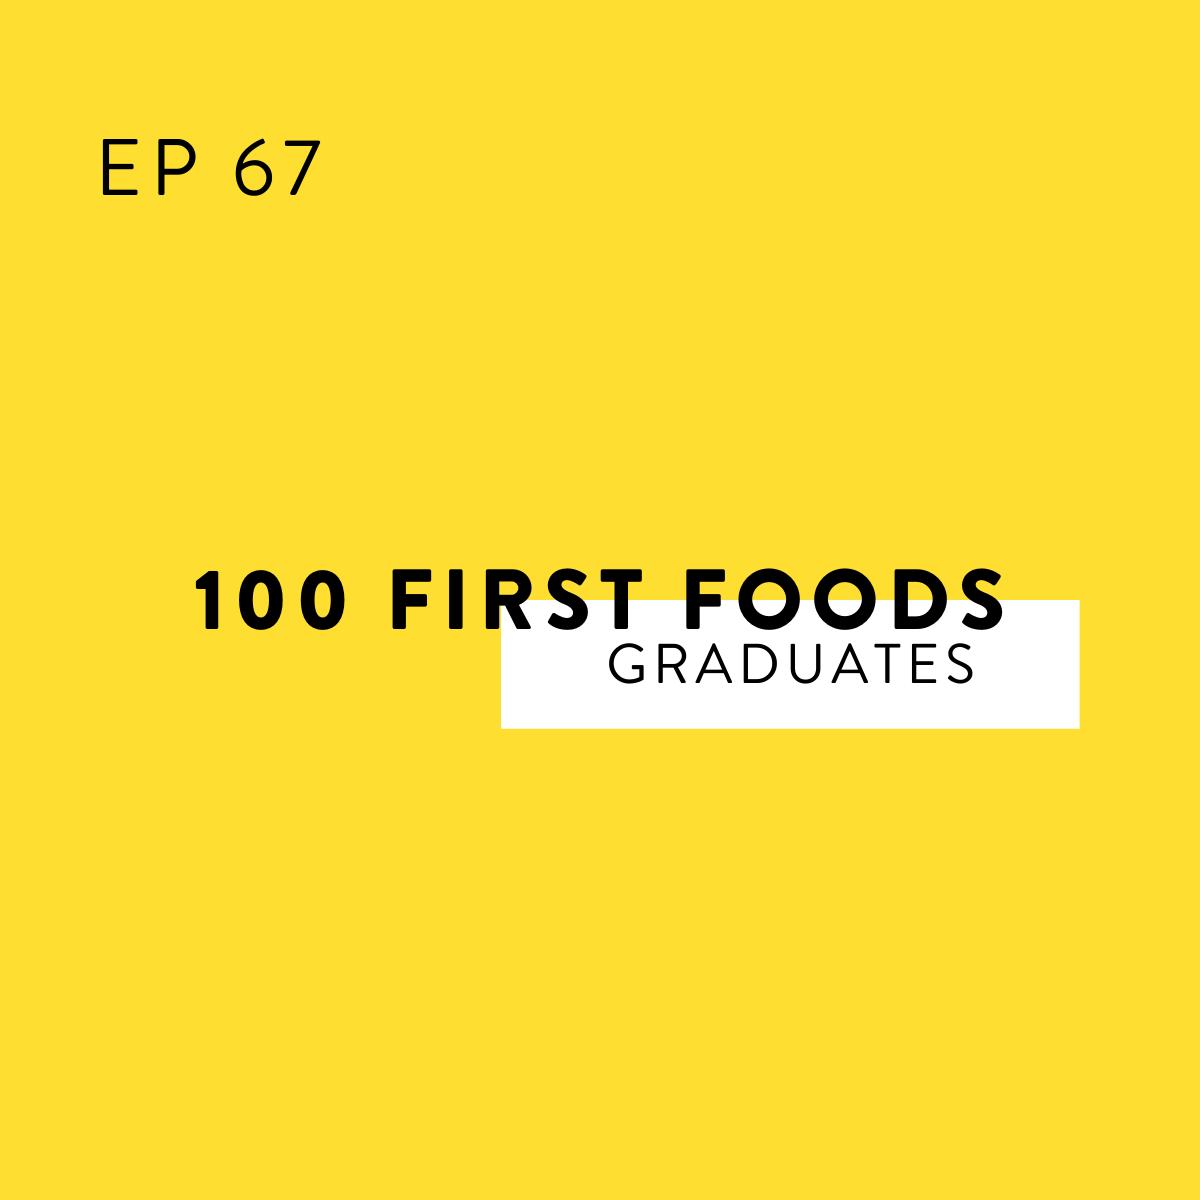 100 First Foods Graduates